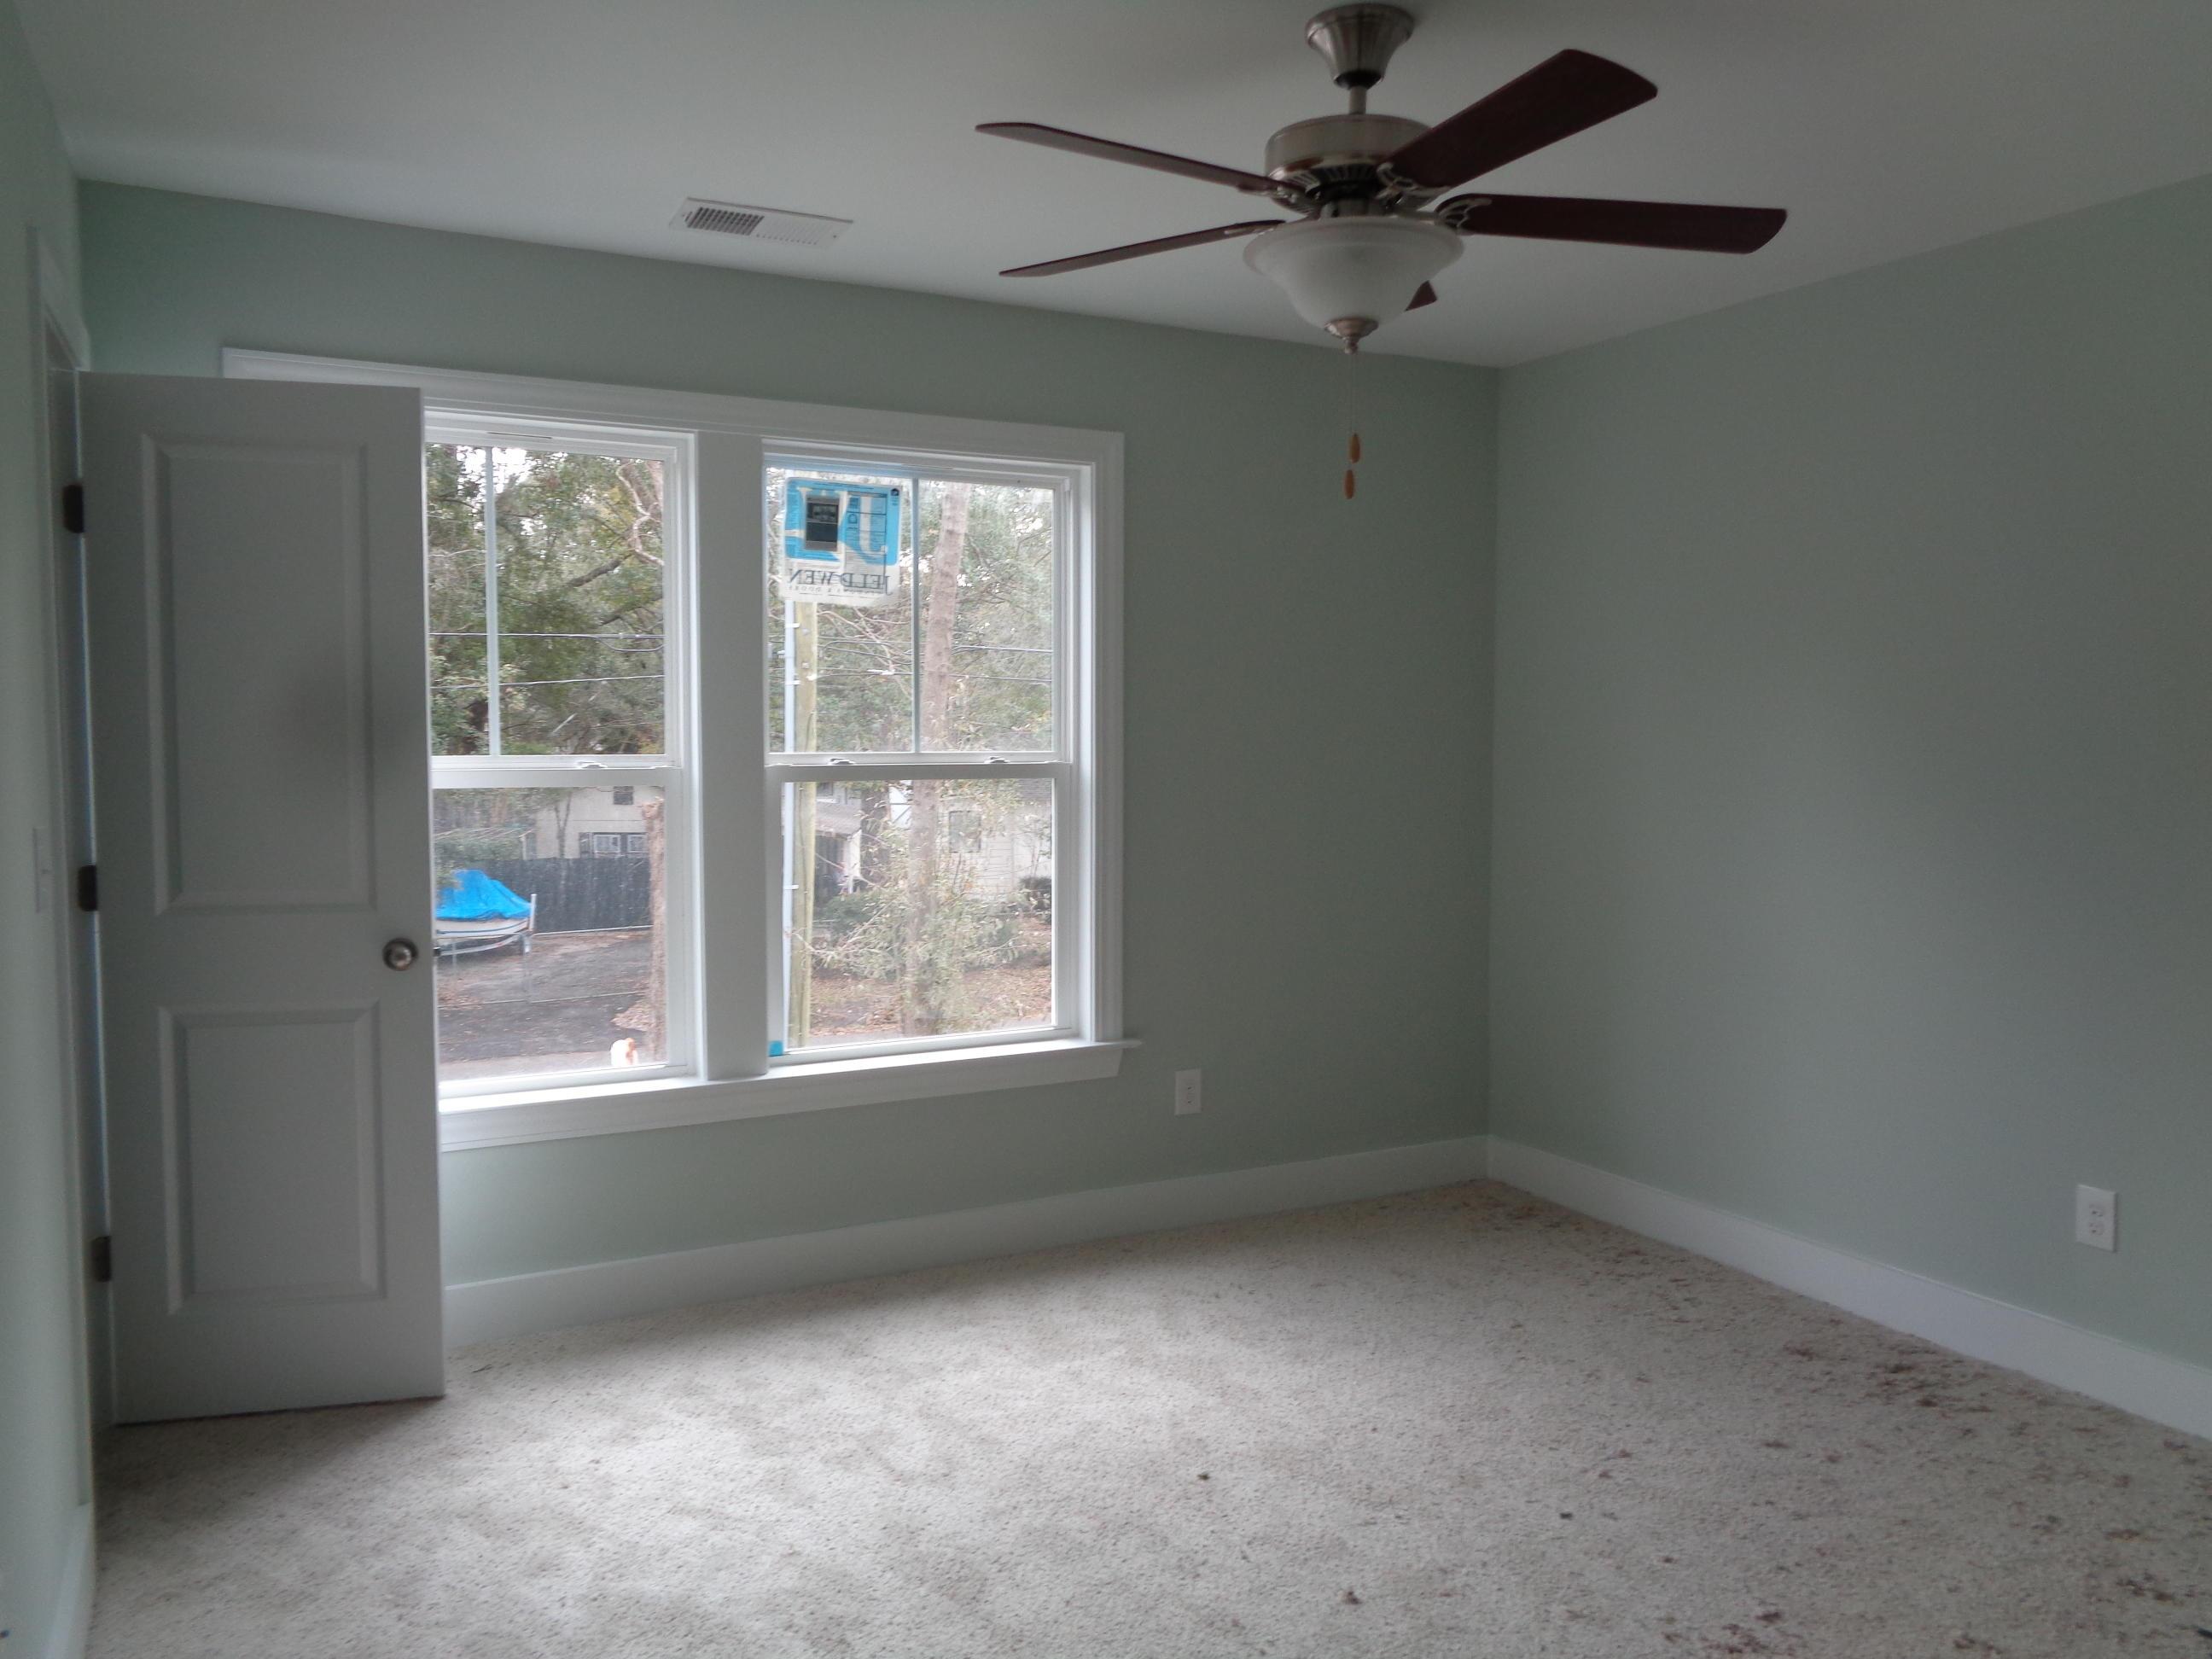 Pinecrest Gardens Homes For Sale - 1626 Wappoo, Charleston, SC - 22